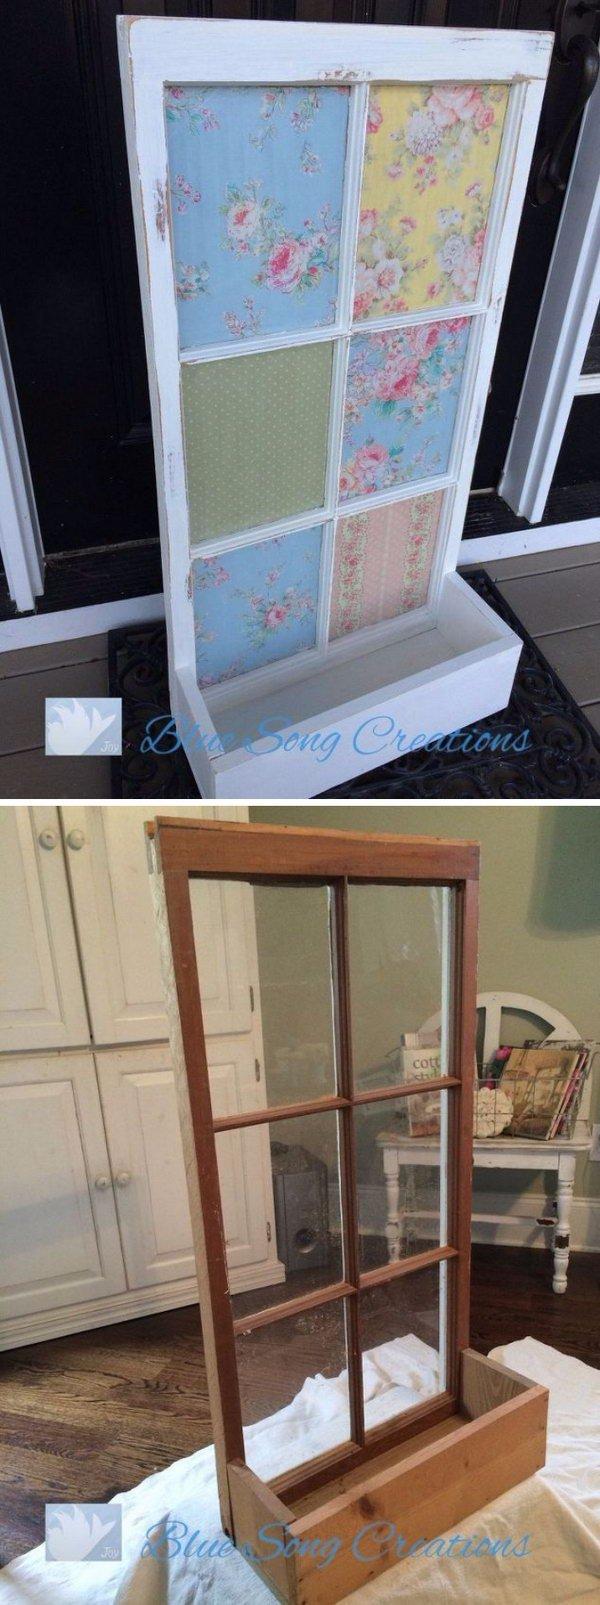 12-diy-shabby-chic-furniture-ideas-tutorials